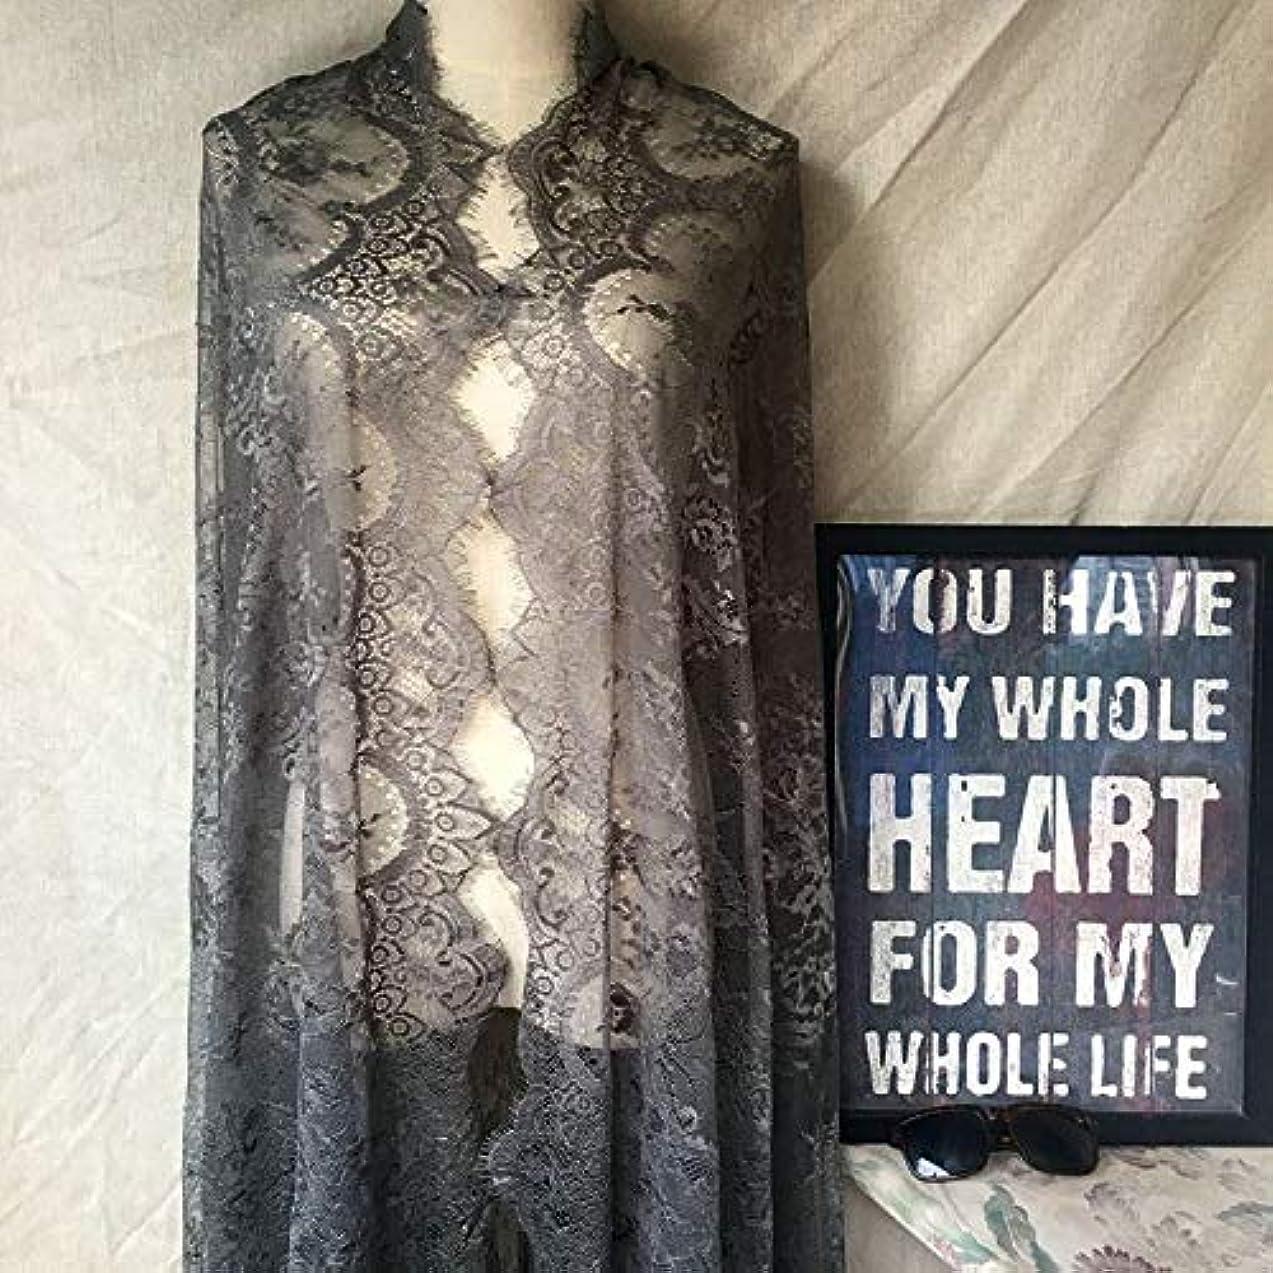 Ivory Lace Fabric Eyelash Chantilly Floral Bridal/Wedding Dress Flower African Lace Table Cloth DIY Crafts Scallop Trim Applique Ribbon Curtains 300cmx150cm ALE02 (Dark Grey)